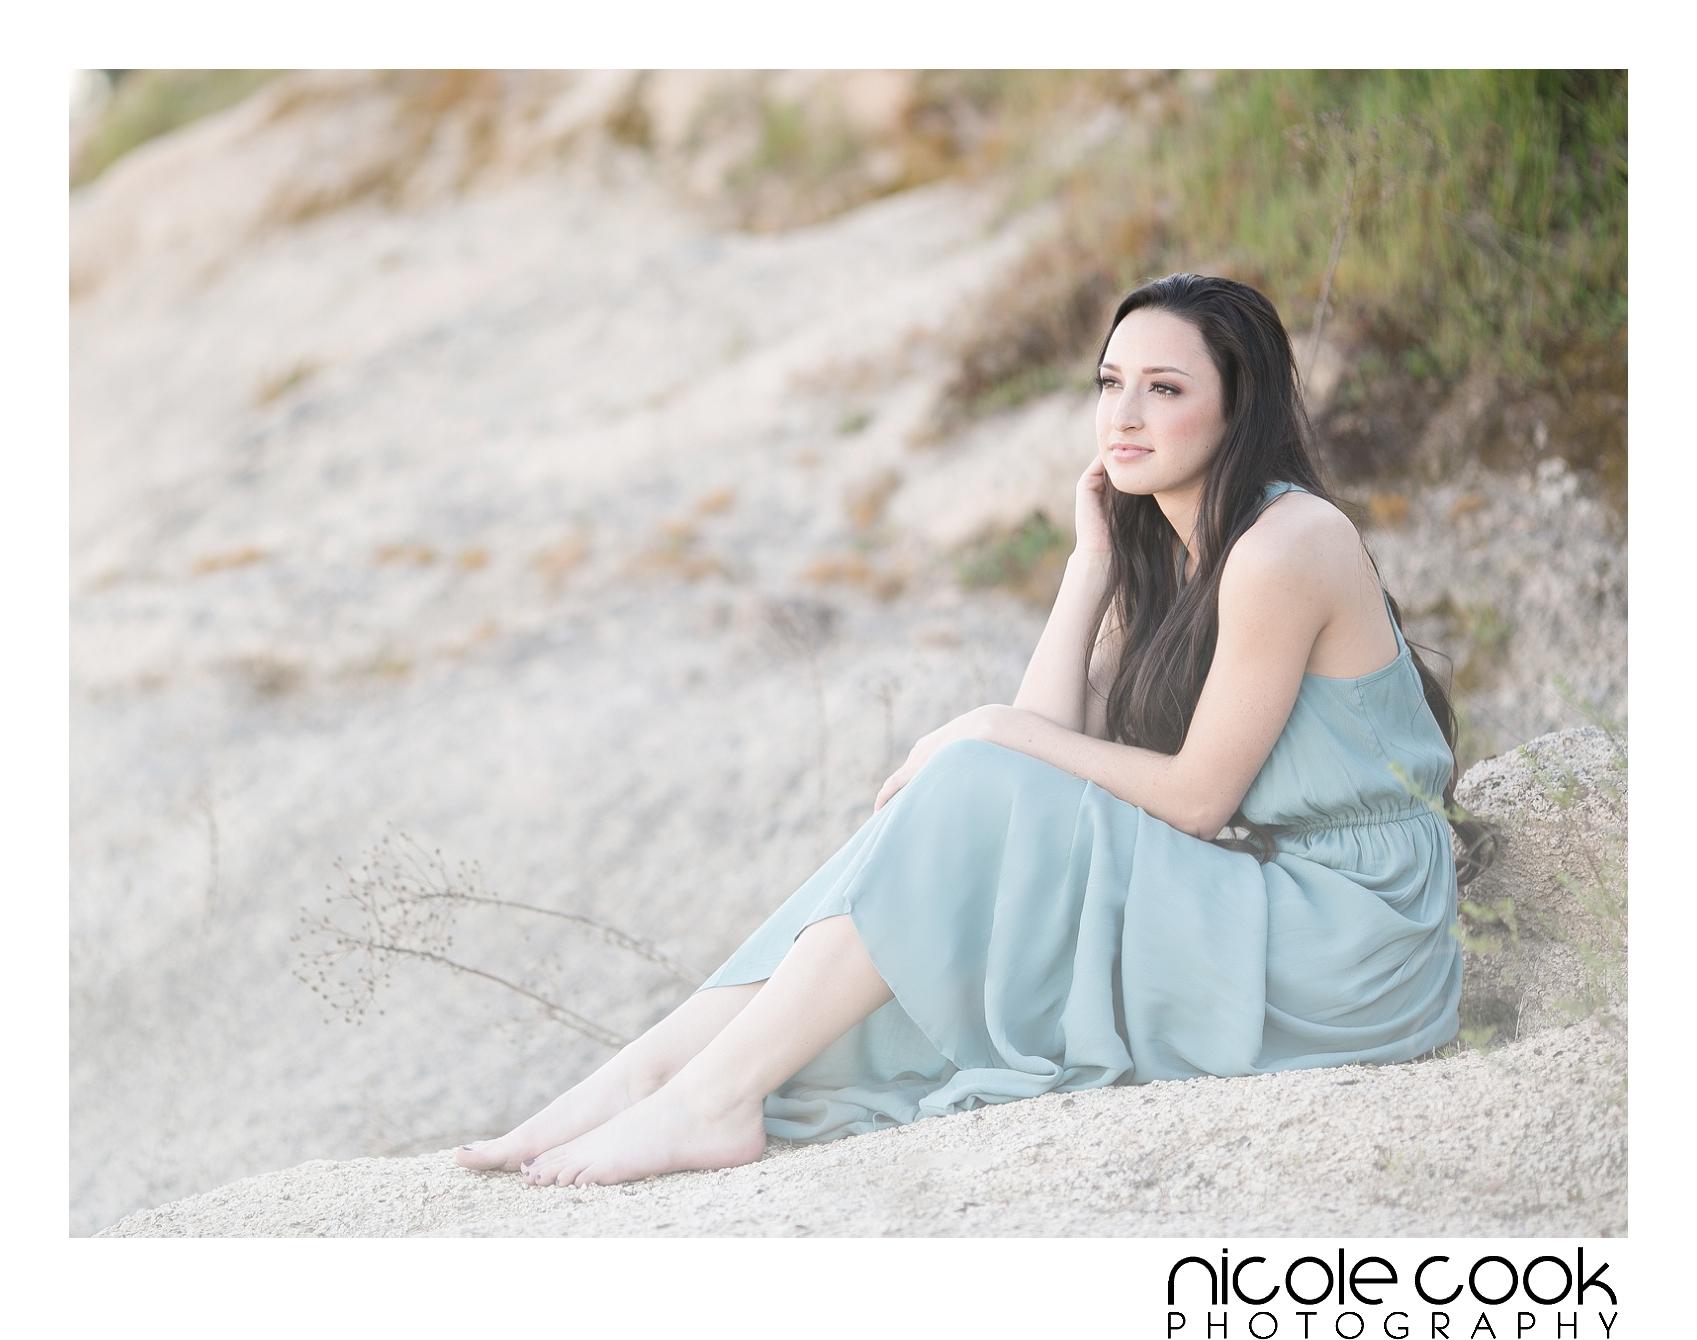 del-oro-high-school-senior-portraits-nicole-cook_0387.jpg